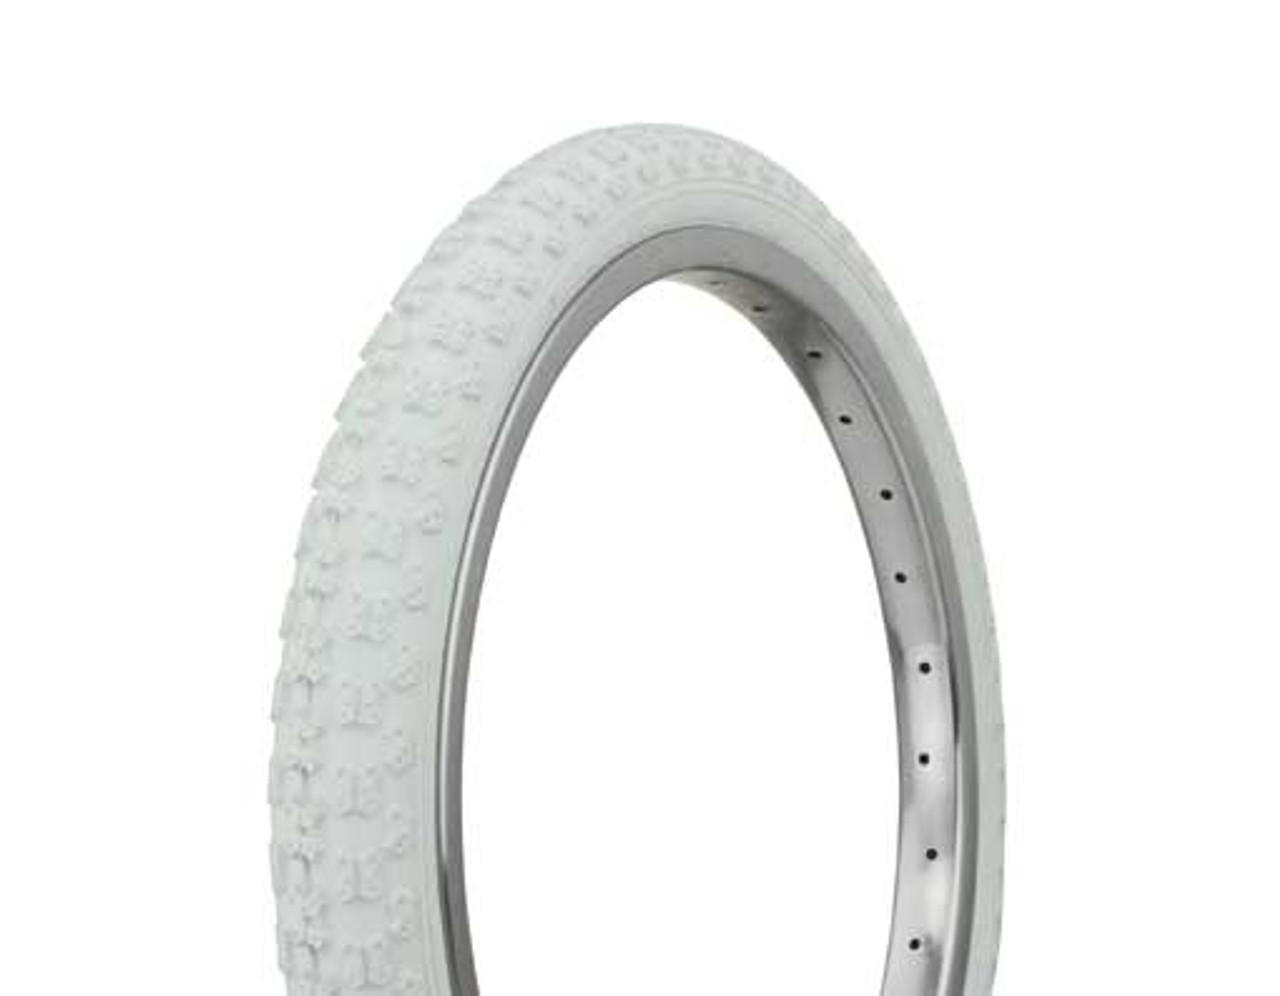 "16/"" tire bike 16/"" x 1.75/"" BLACK AND WHITE LOW RIDER W//WRITING NEW 16 X 1.75 LOGO"